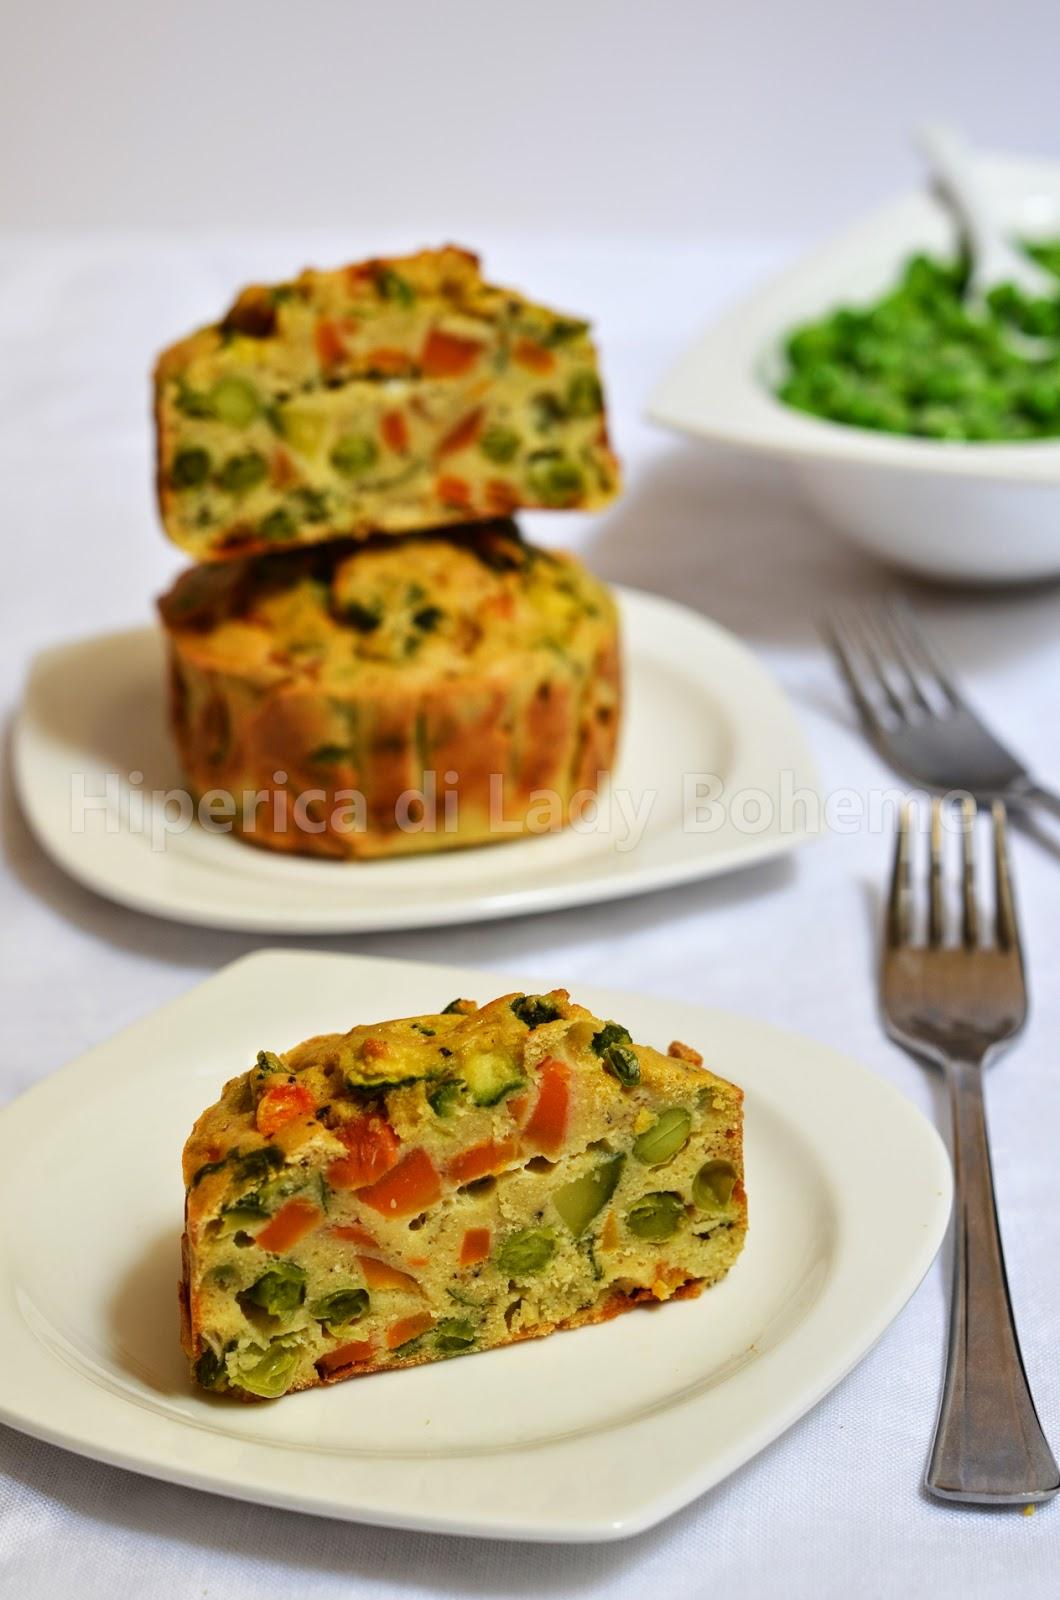 hiperica di lady boheme ricetta tortino di verdure al forno